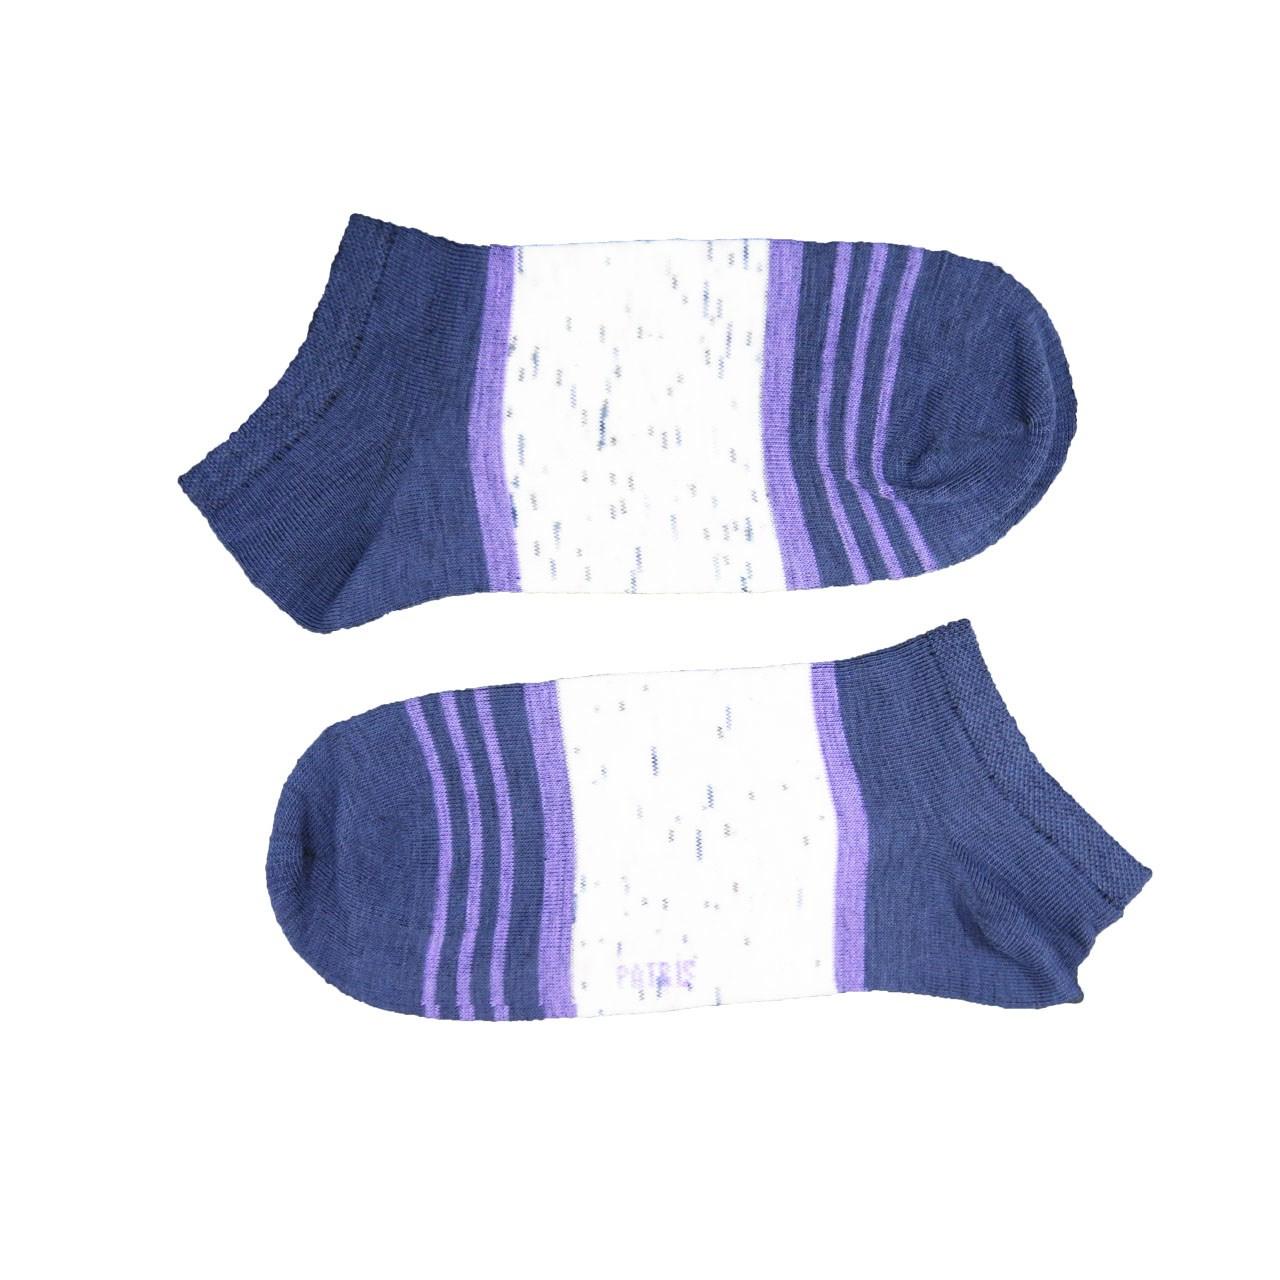 جوراب زنانه پاتریس مدل 401009